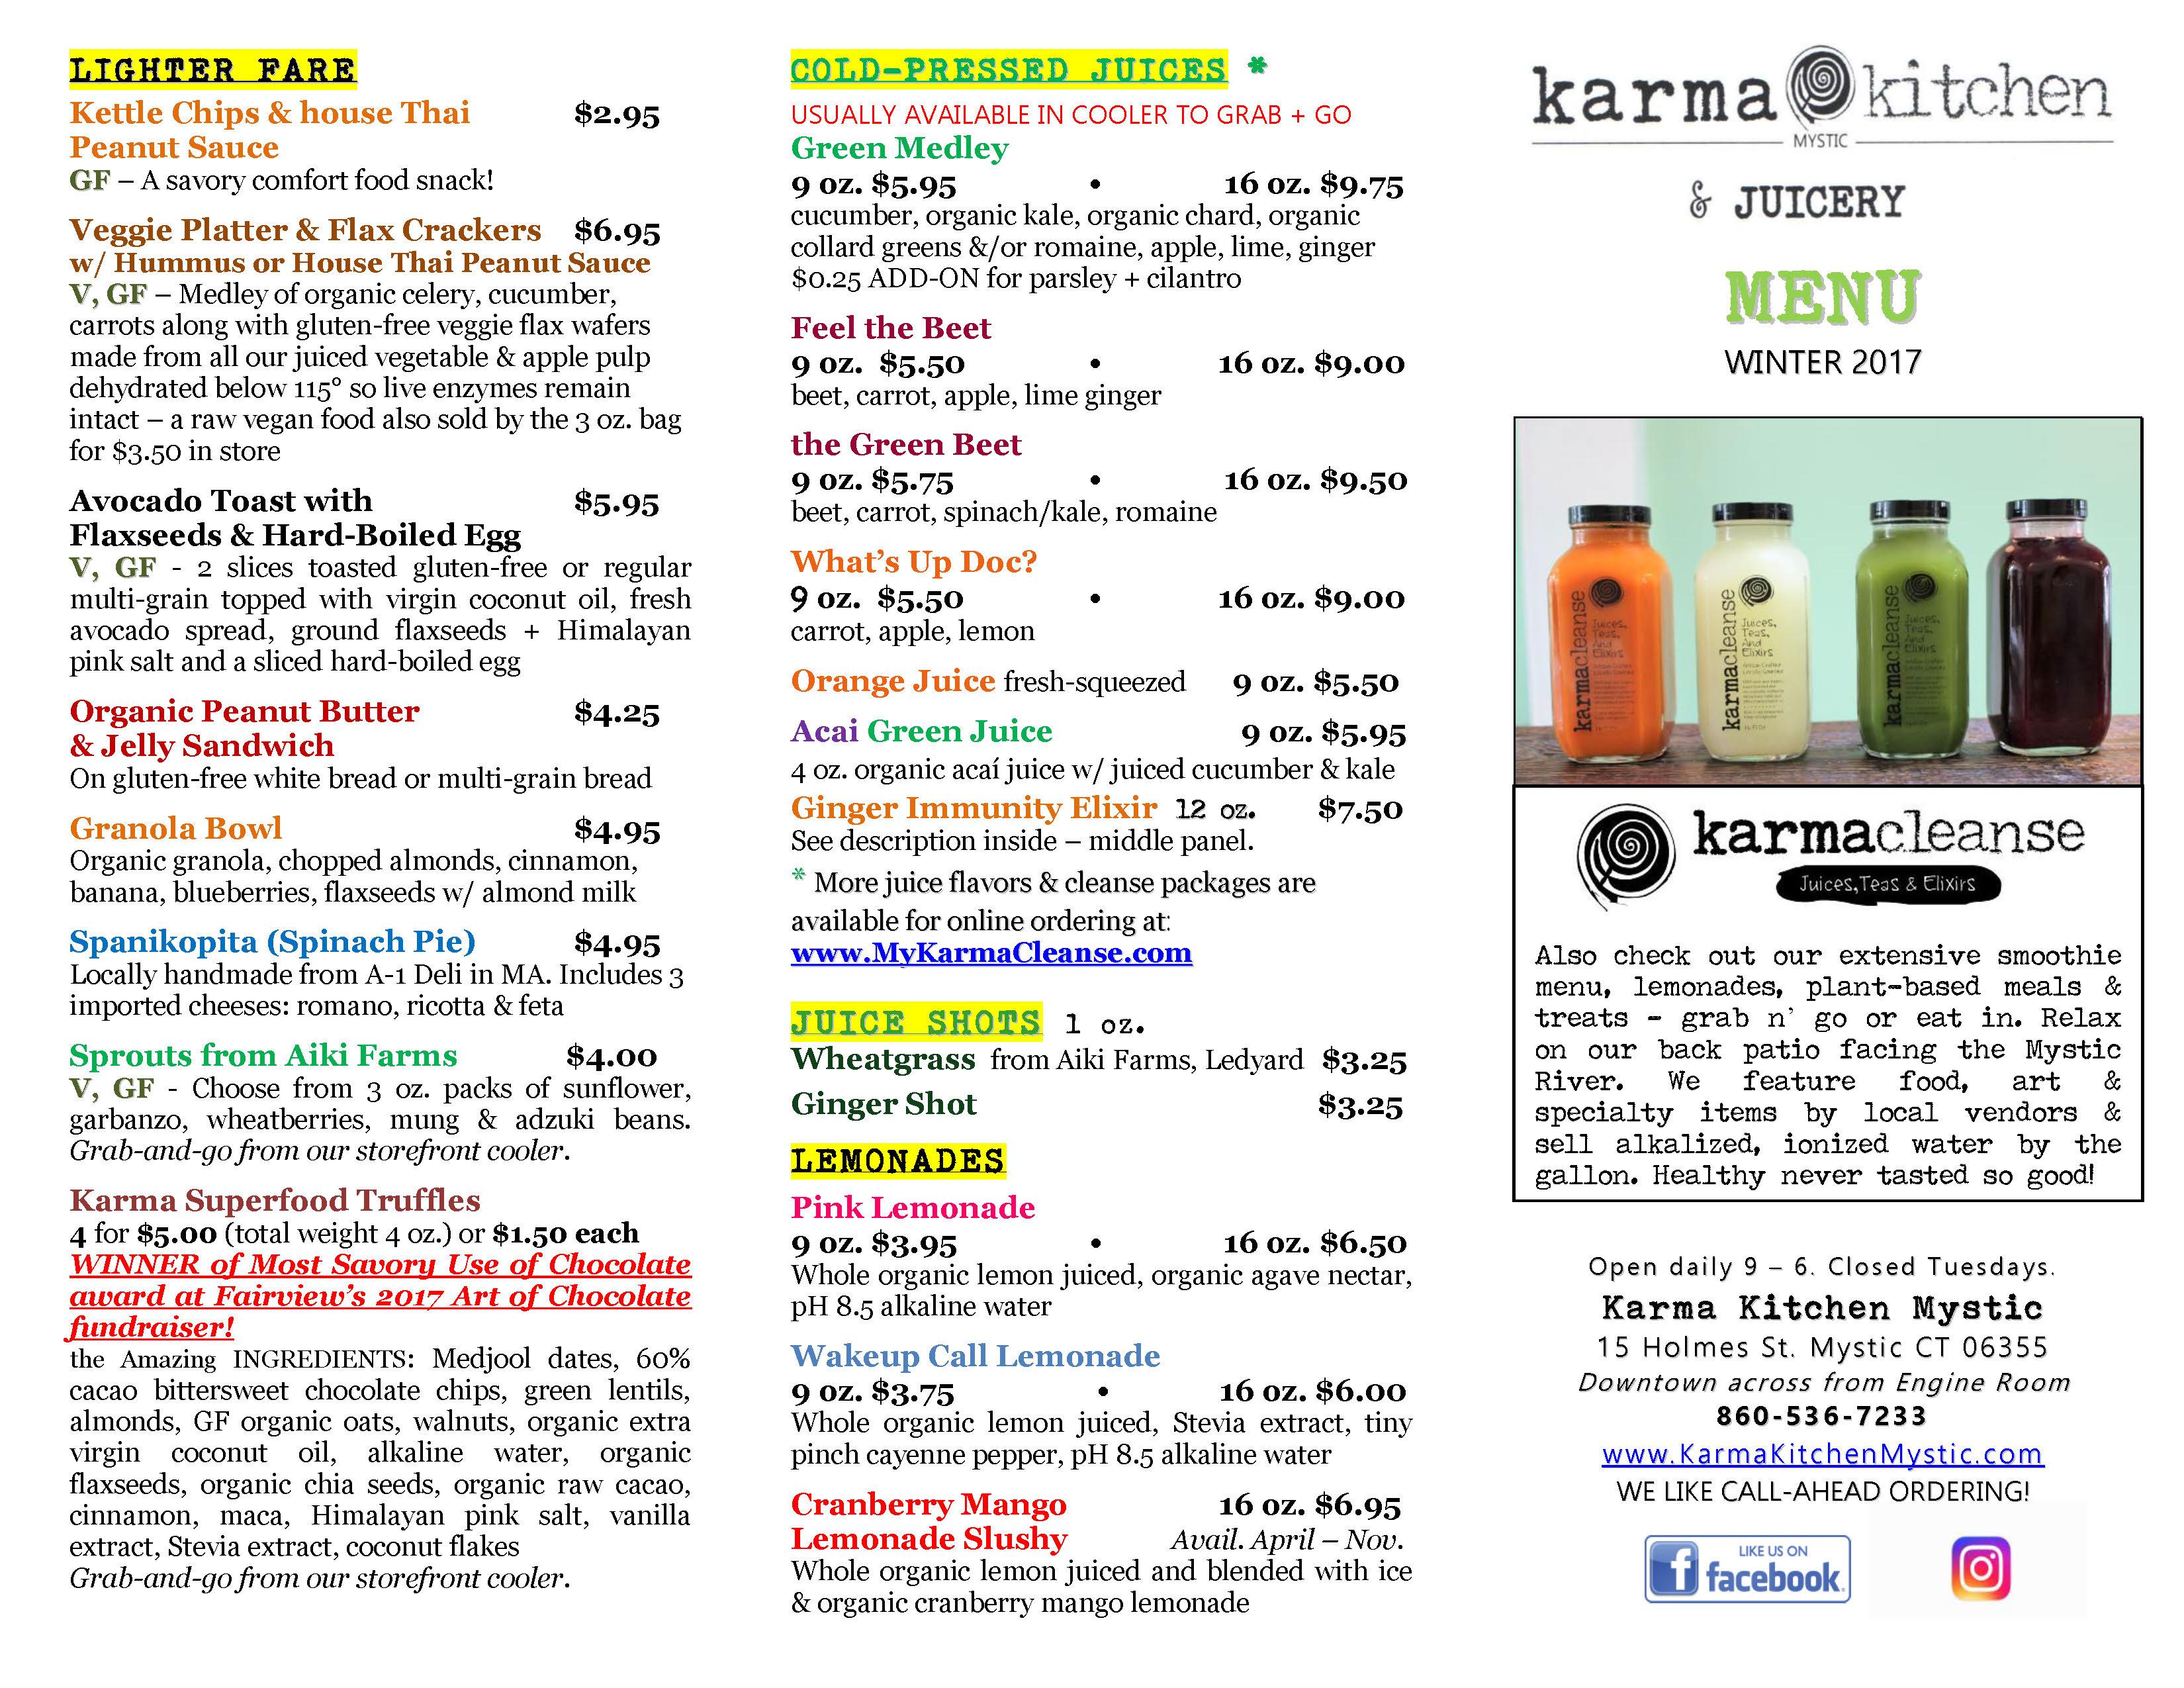 Karma Kitchen Mystic | This Is Mystic, CT